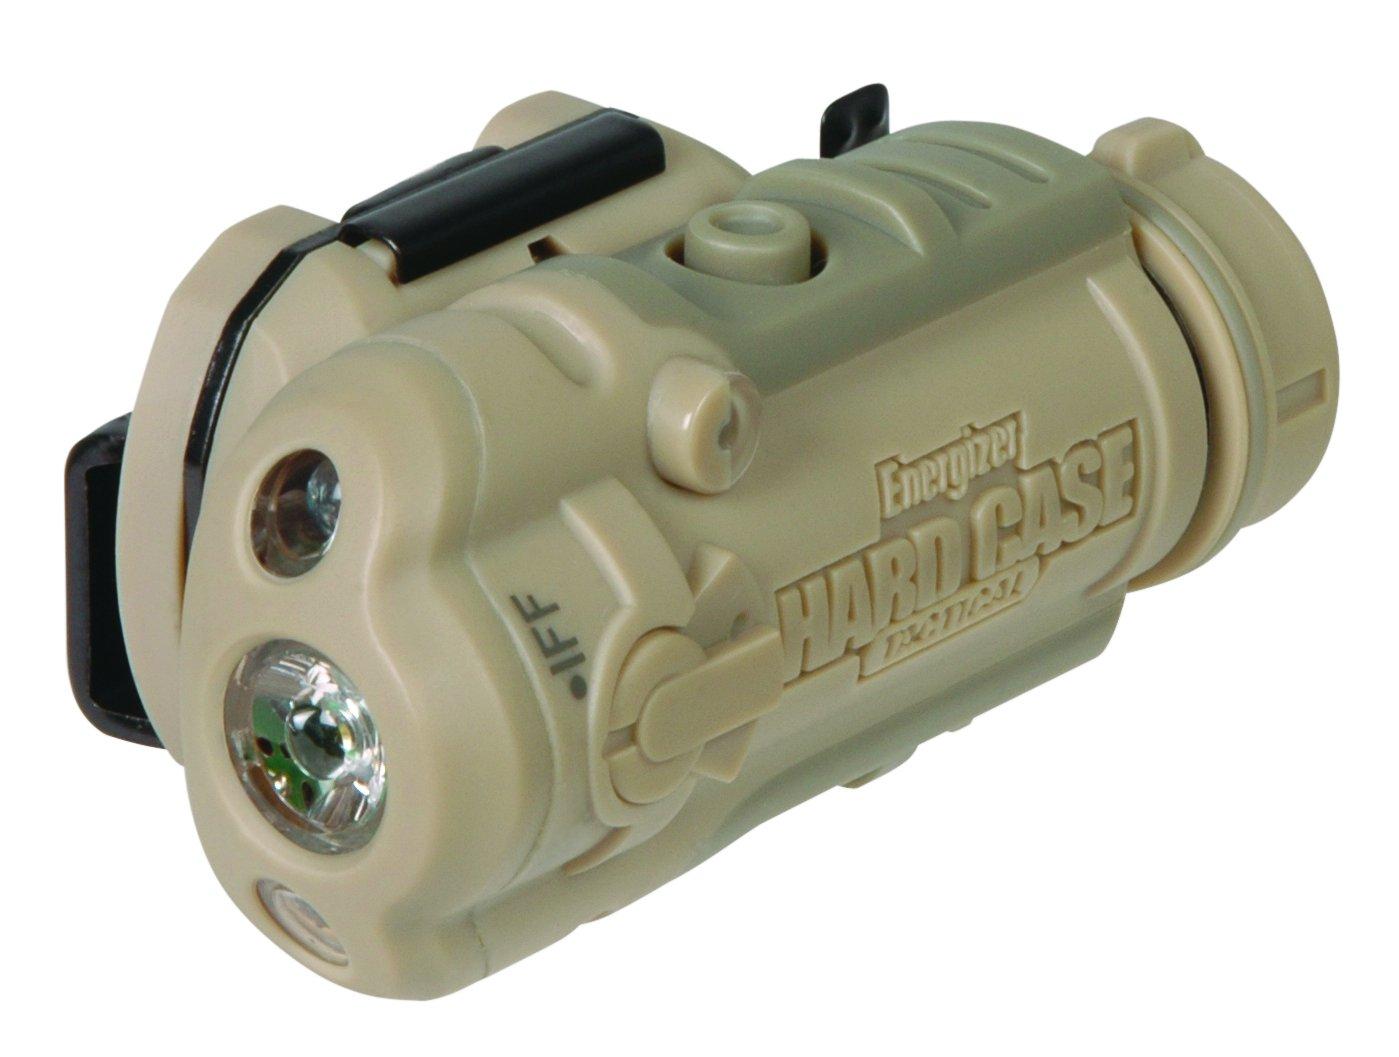 Energizer HardCase Tactical Tango 1AA LED Helmet Light